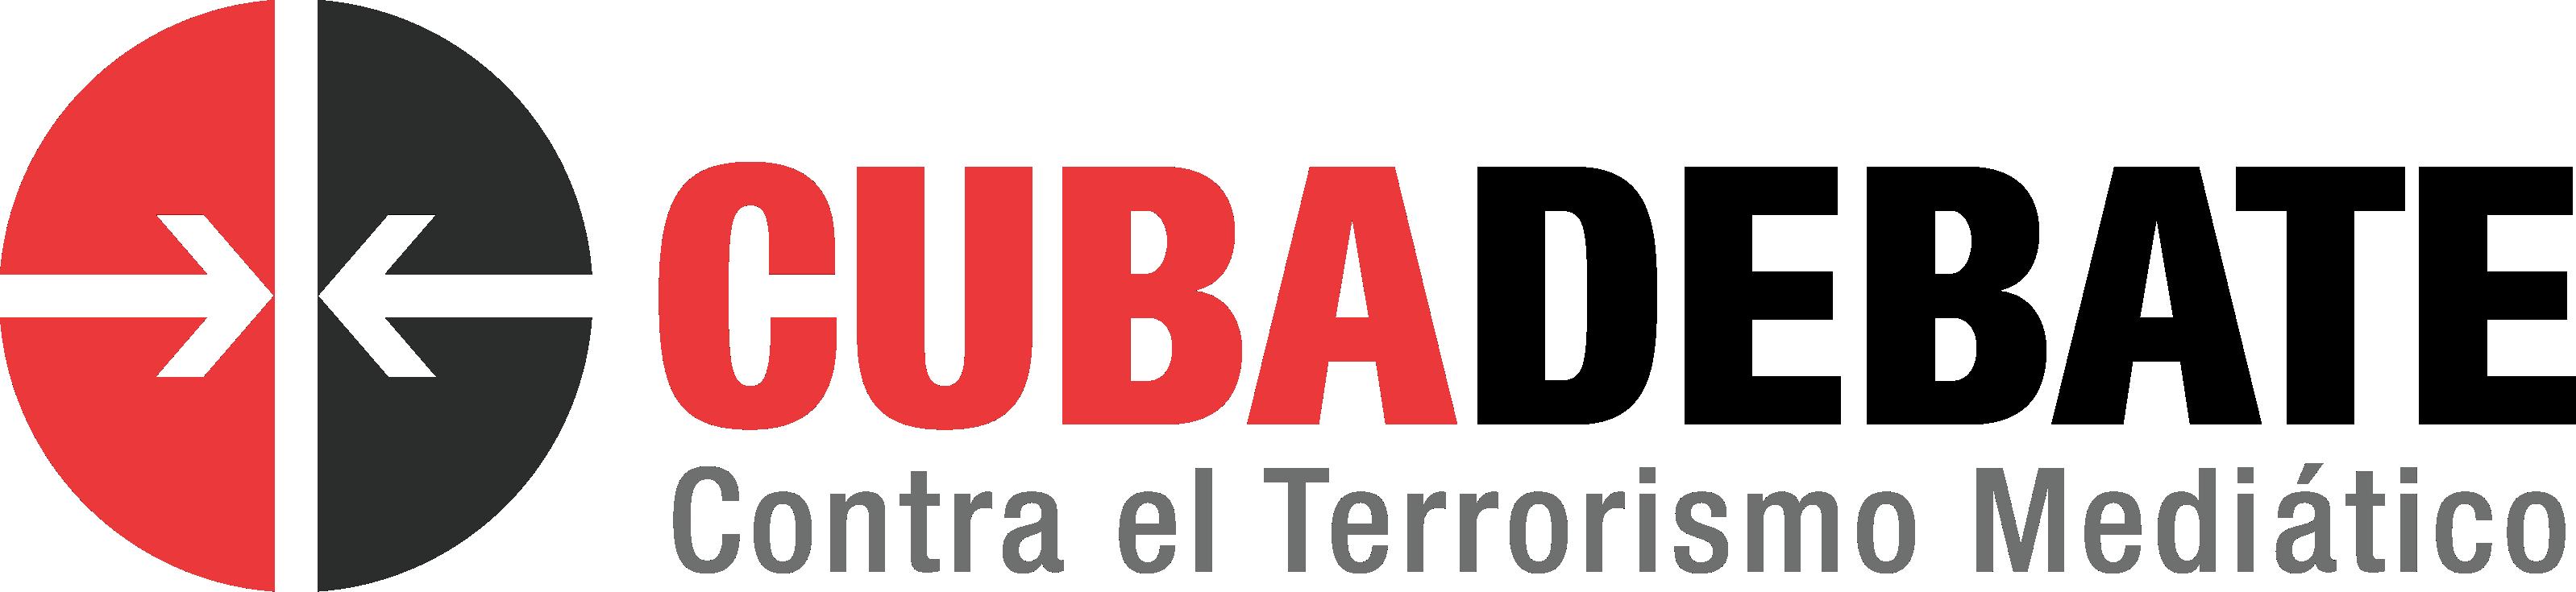 Risultati immagini per cubadebate logo